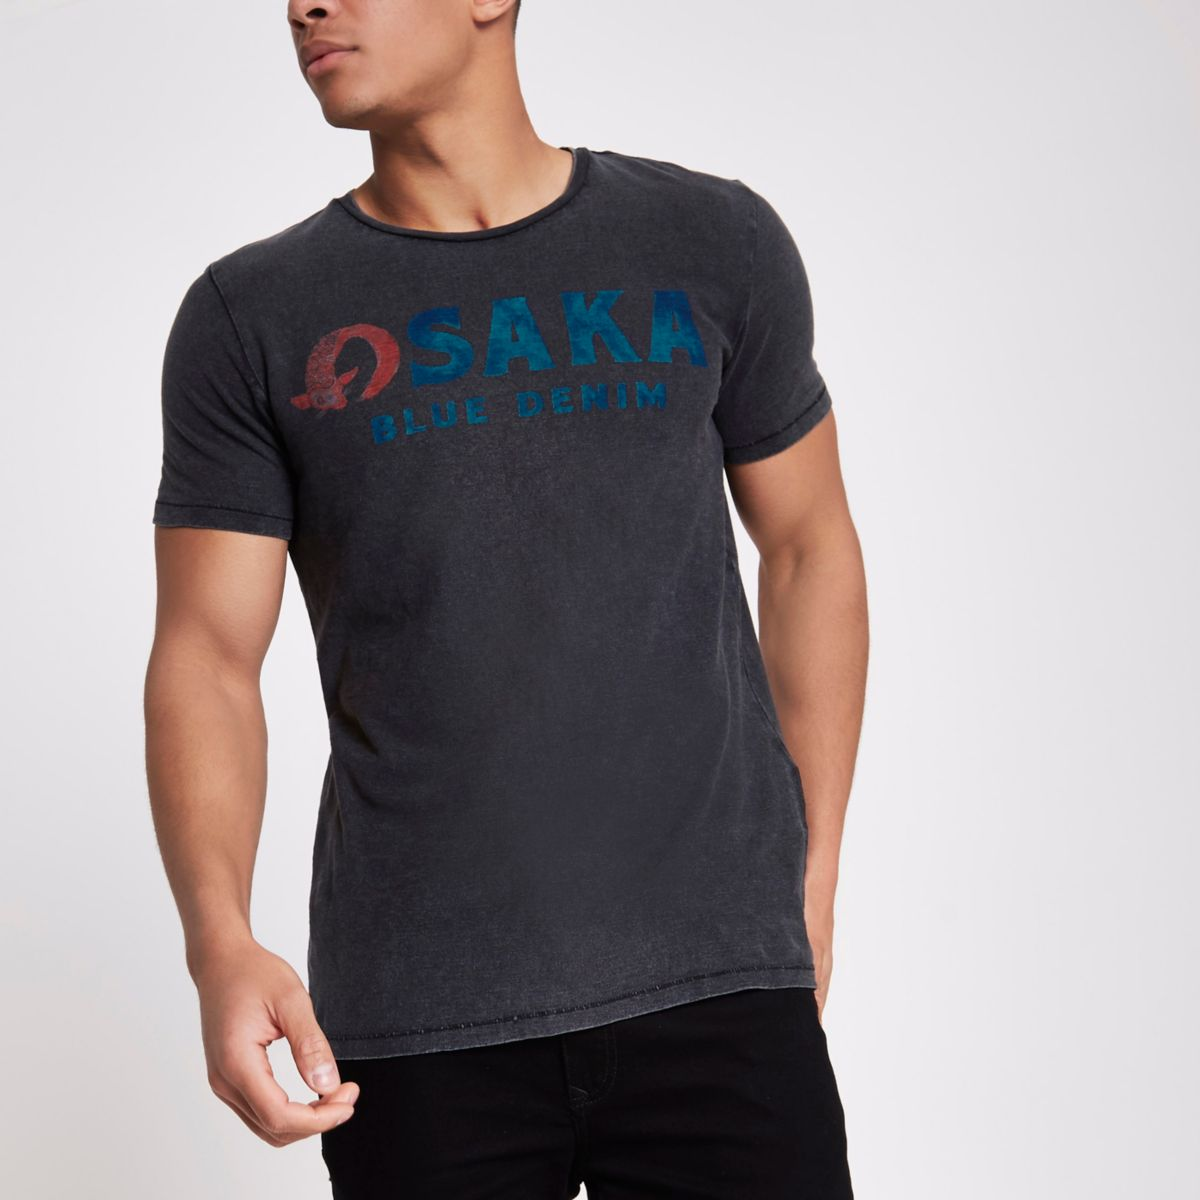 Jack & Jones black 'Osaka' T-shirt